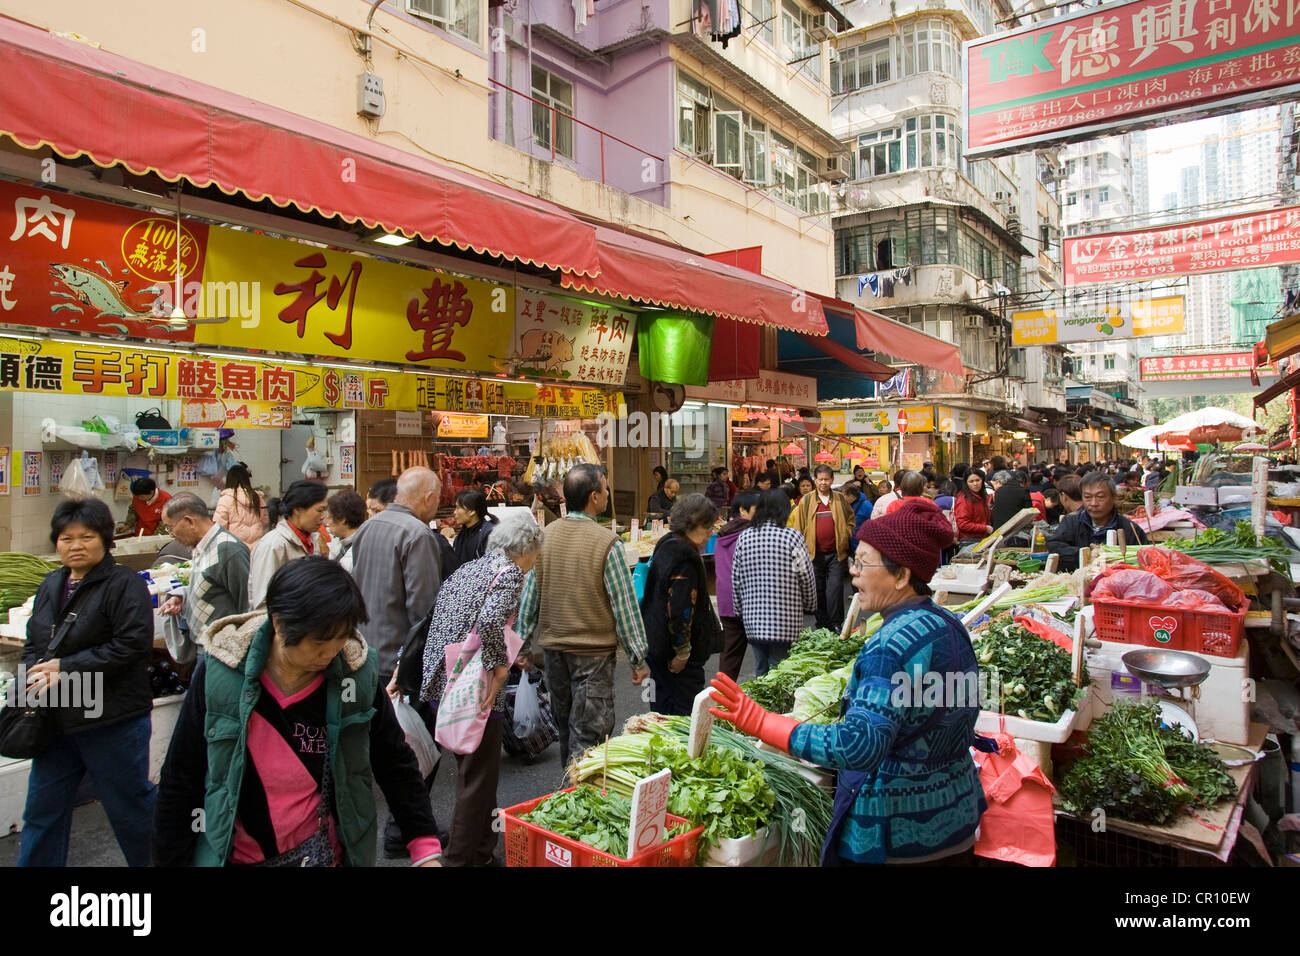 La Chine, Hong Kong, Kowloon, marché aux fruits, légumes, poissons Photo Stock